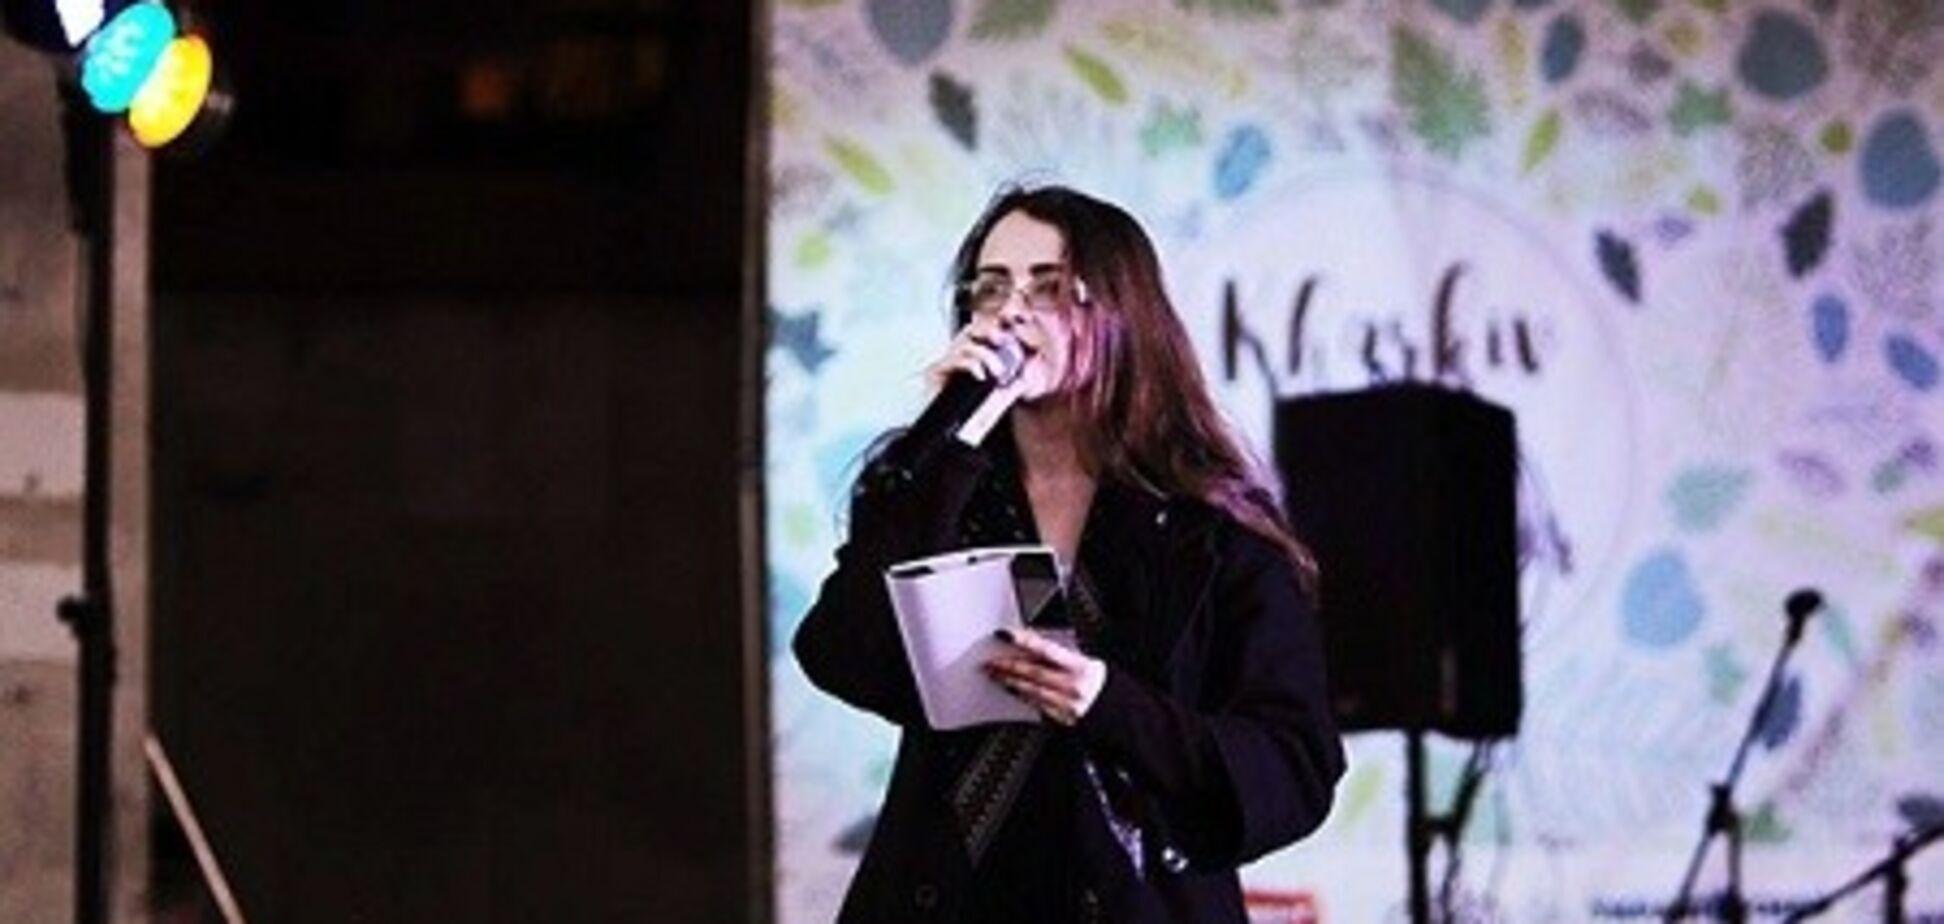 Свято мистецтва Kharkiv poetry open air